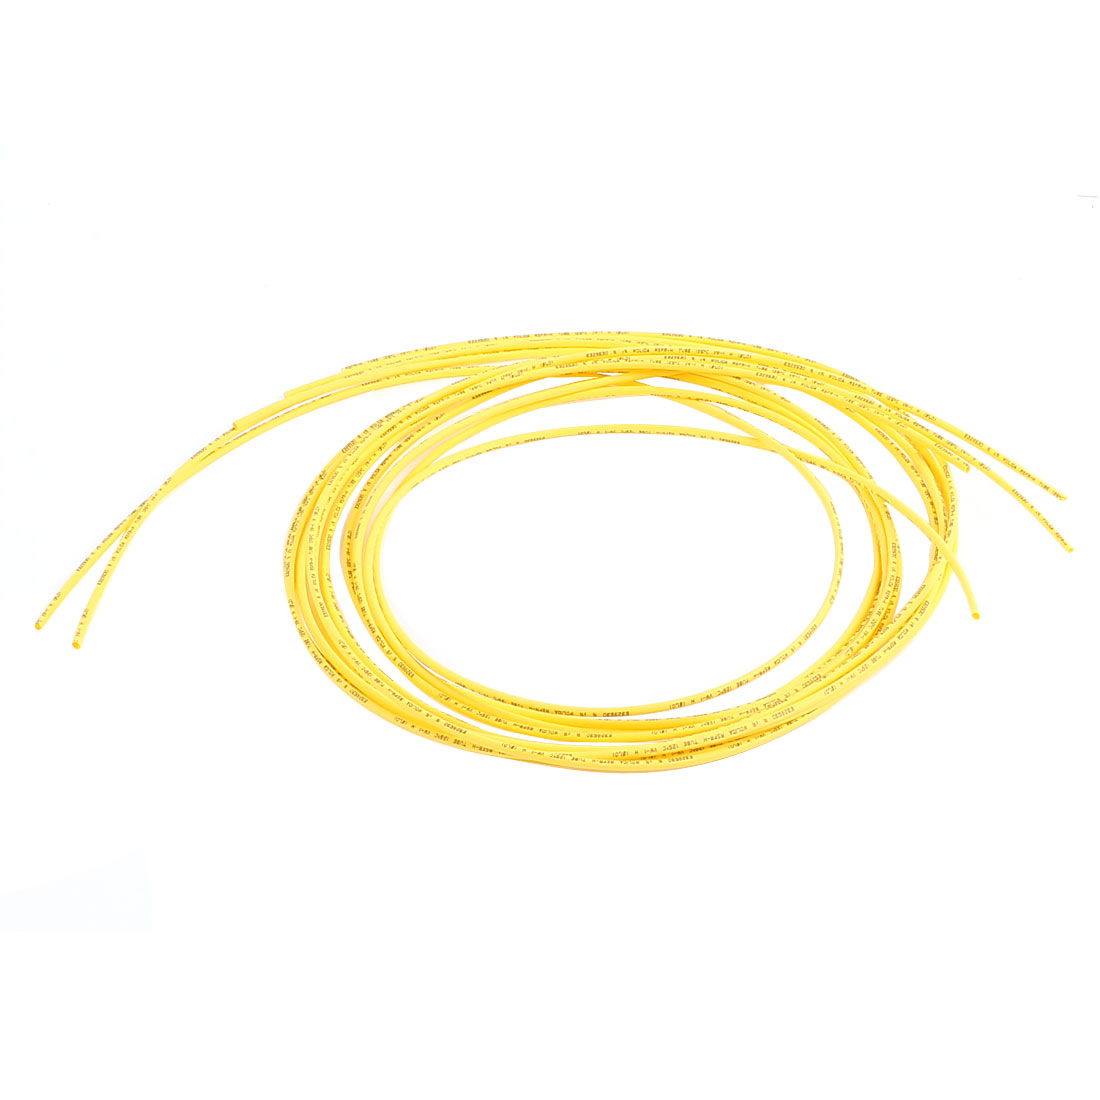 Ratio 2:1 Yellow Polyolefin 1mm Dia Heat Shrink Shrinkable Tube 1M 5pcs